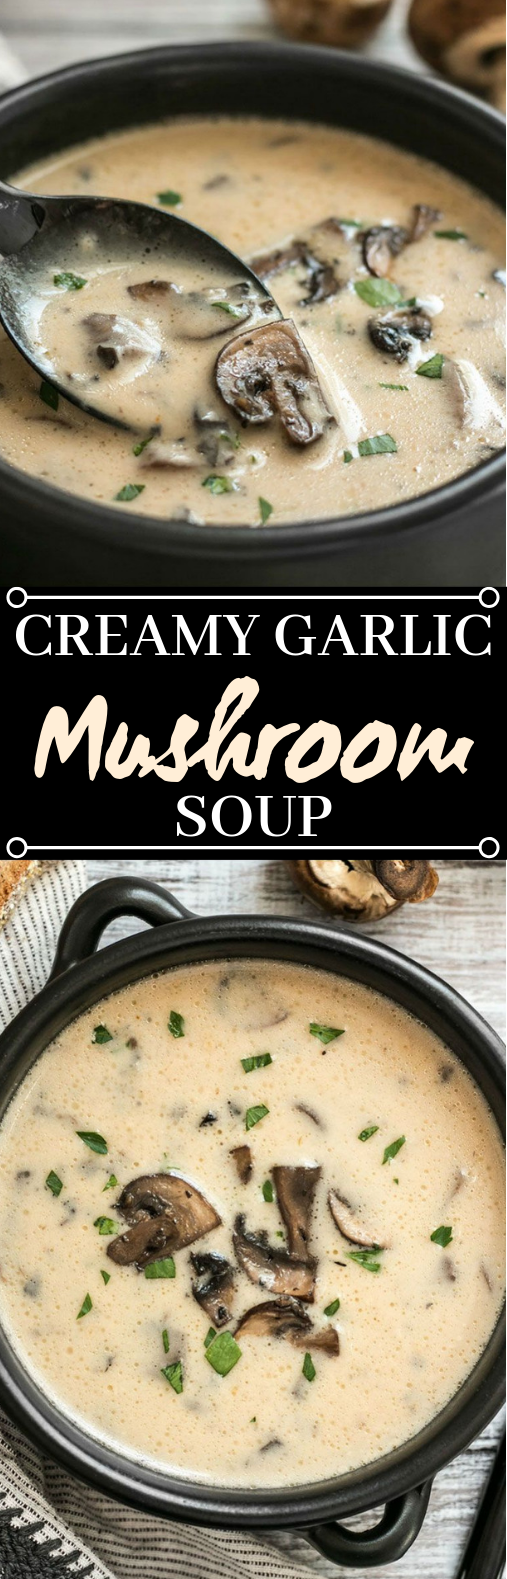 Creamy Garlic Mushroom Soup #vegetarian #soup